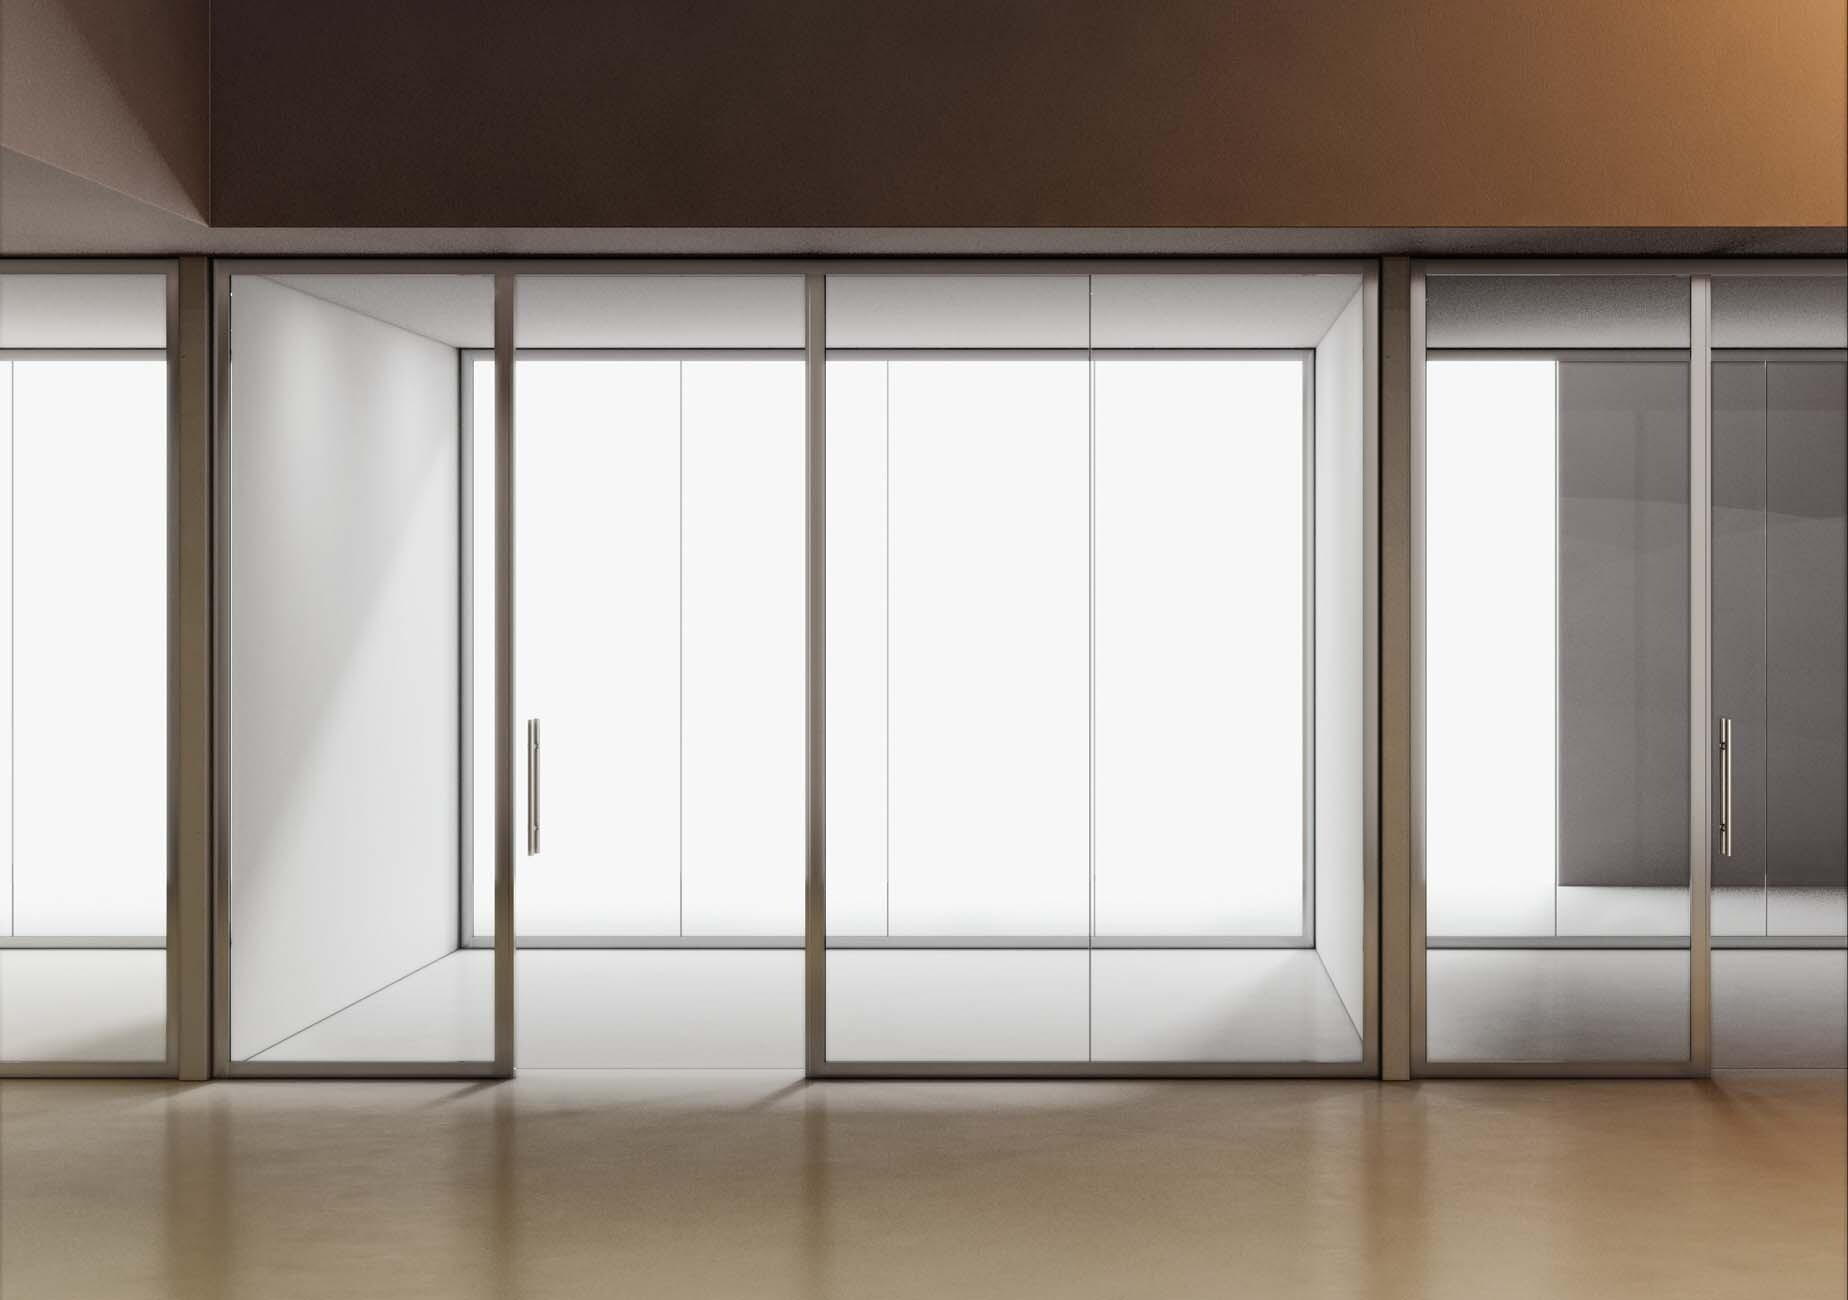 vetrata-scorrevole-dwel-16-2.jpg